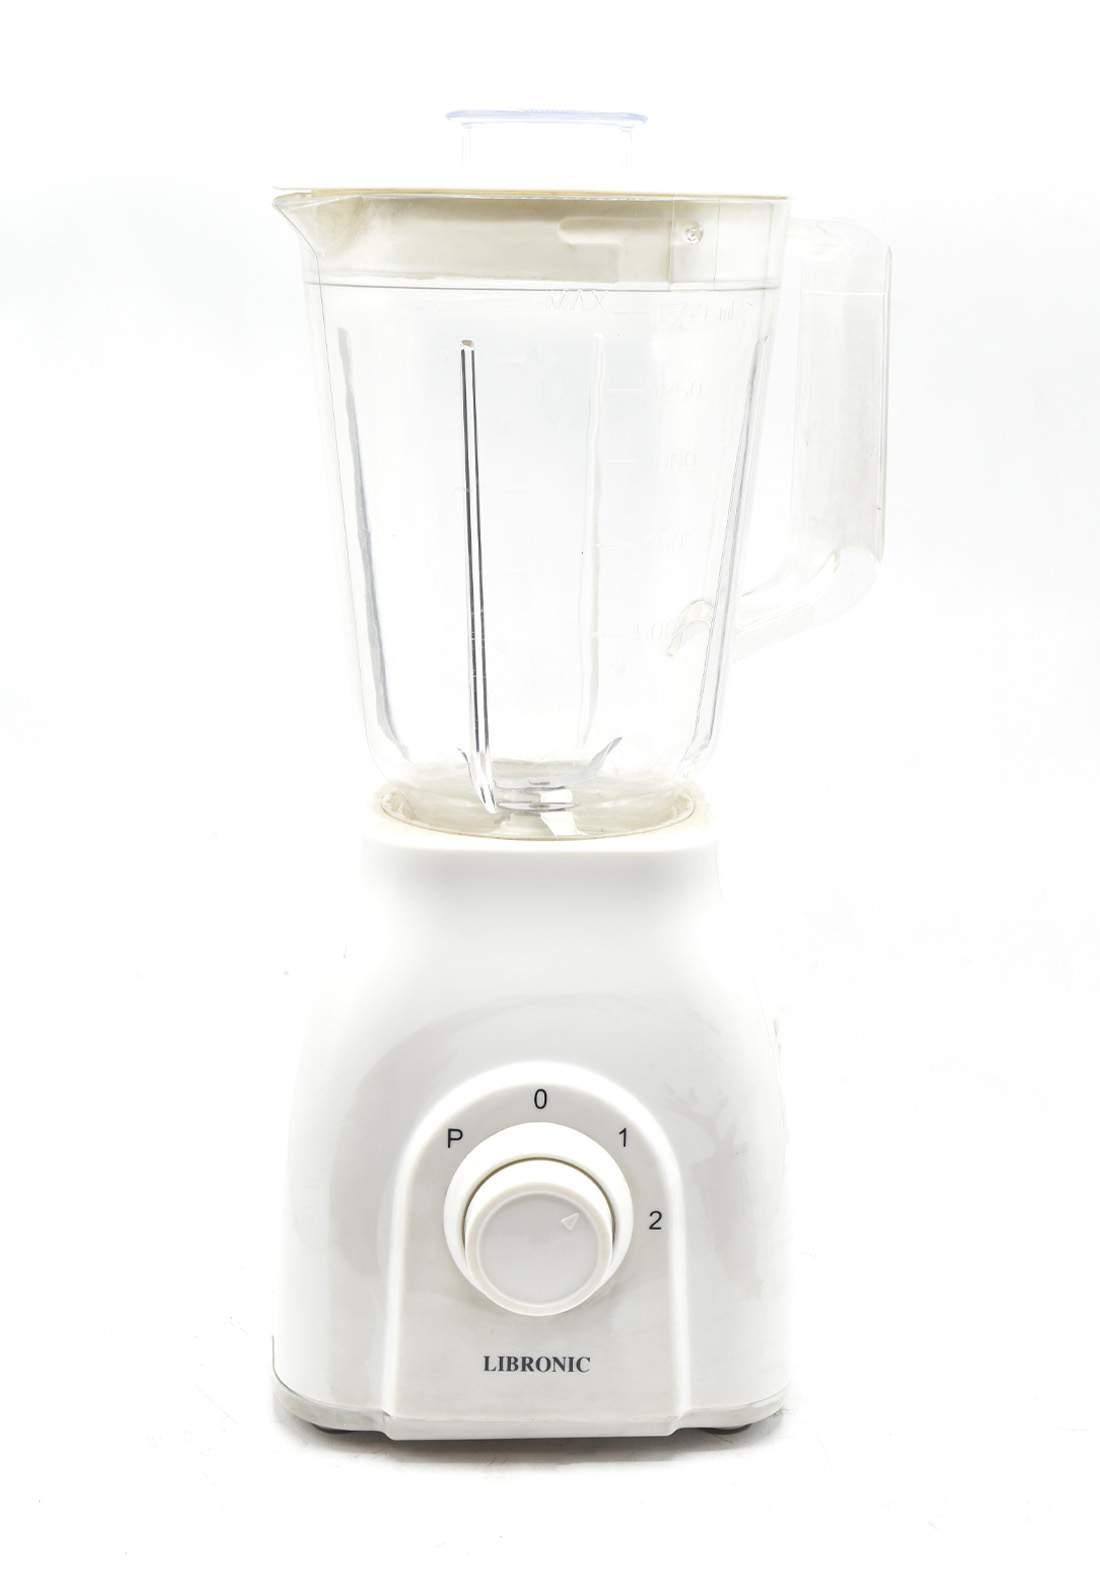 Libronic SR-5880 An Electric Mixer خلاط كهربائي